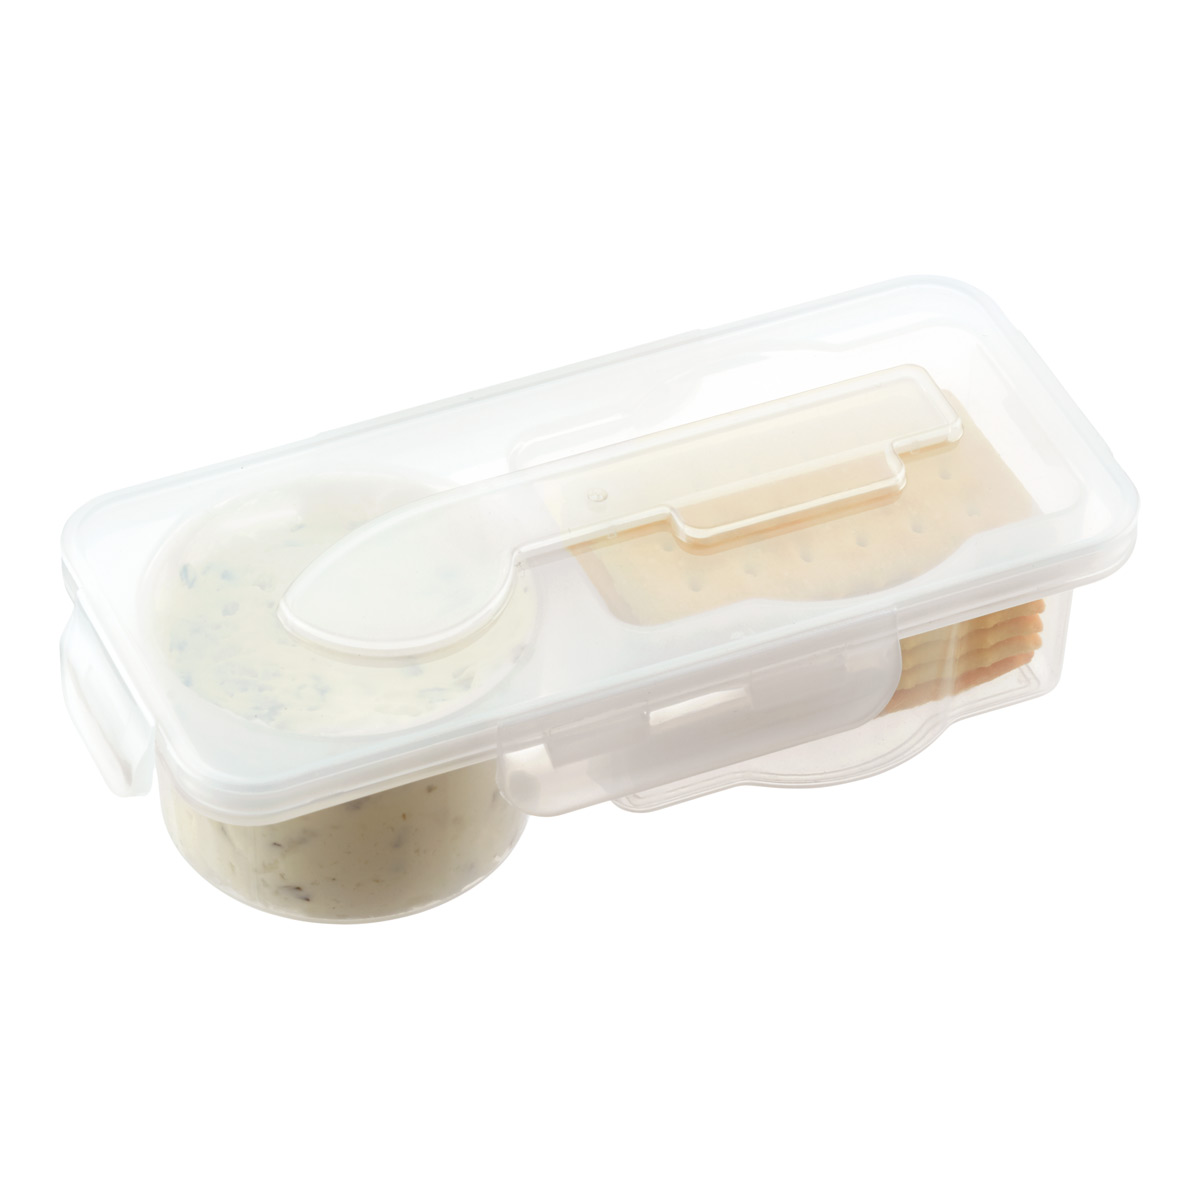 Cracker & Spread Container